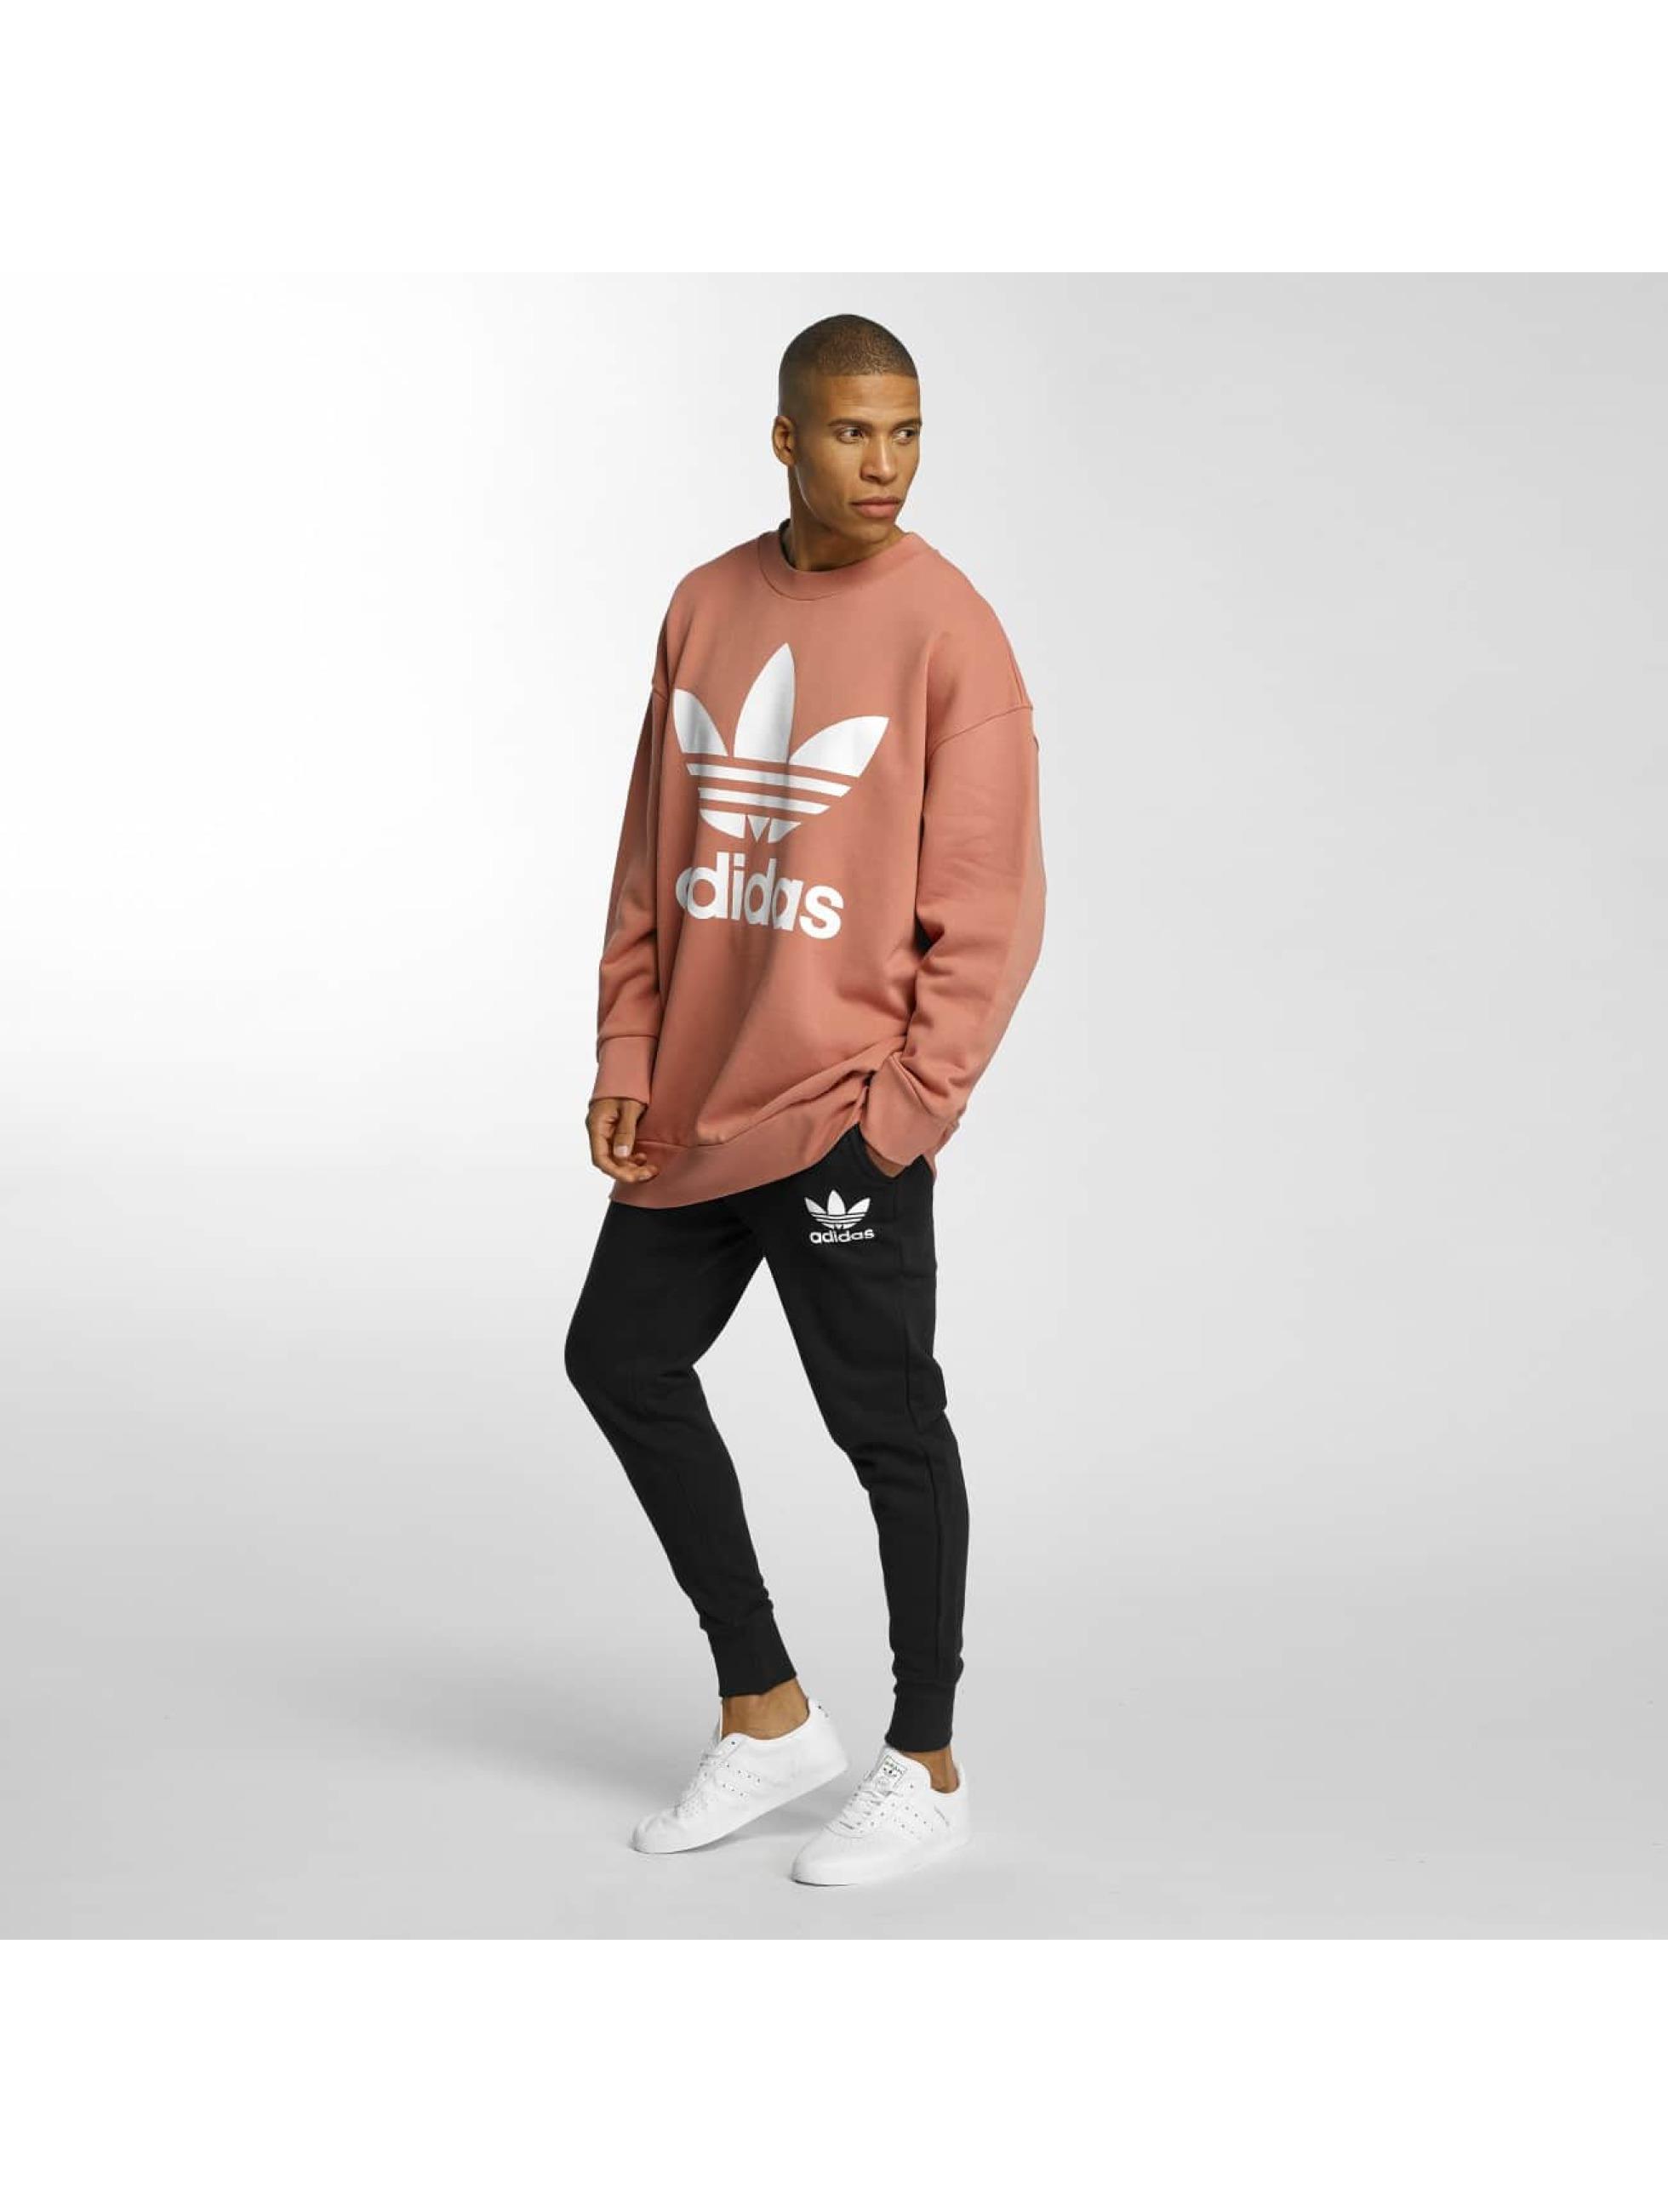 adidas Jogging ADC F noir